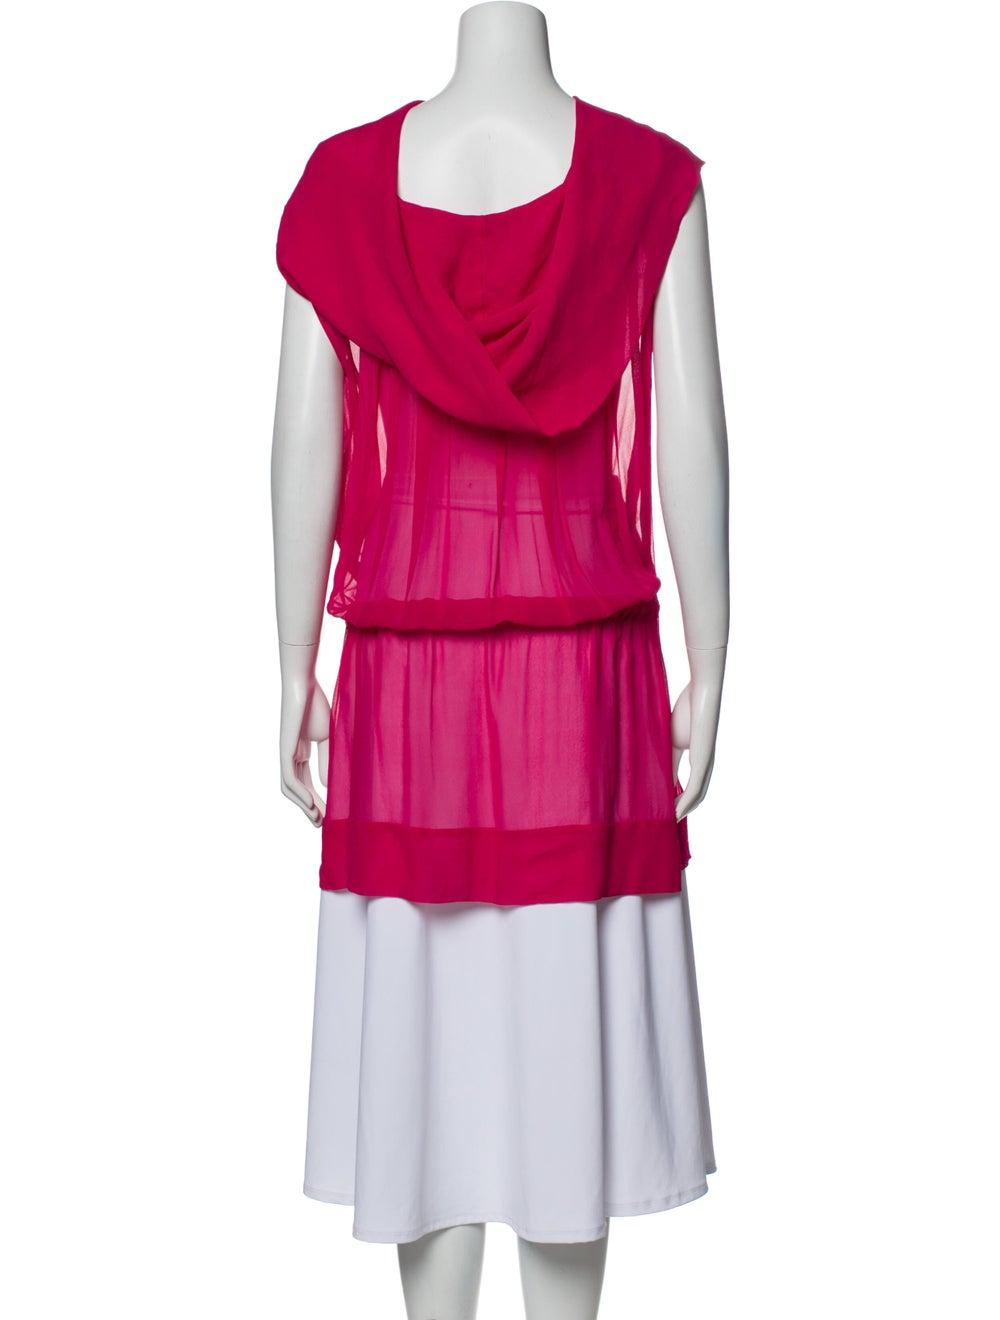 Plein Sud Silk Cowl Neck Tunic Pink - image 3